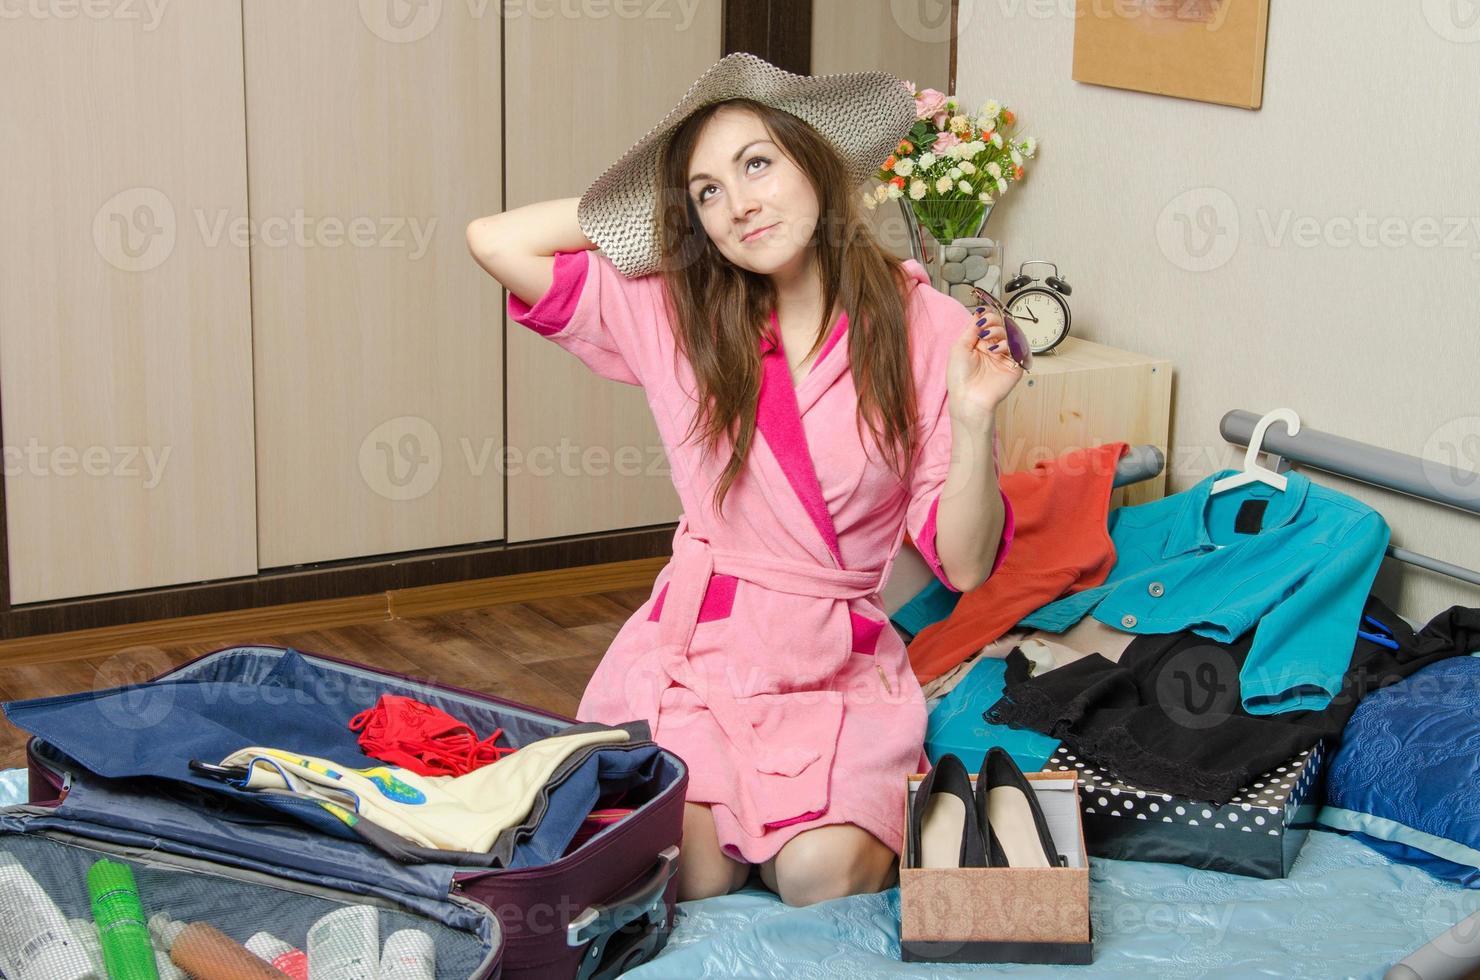 tjej drömmer om semester packa resväskor foto